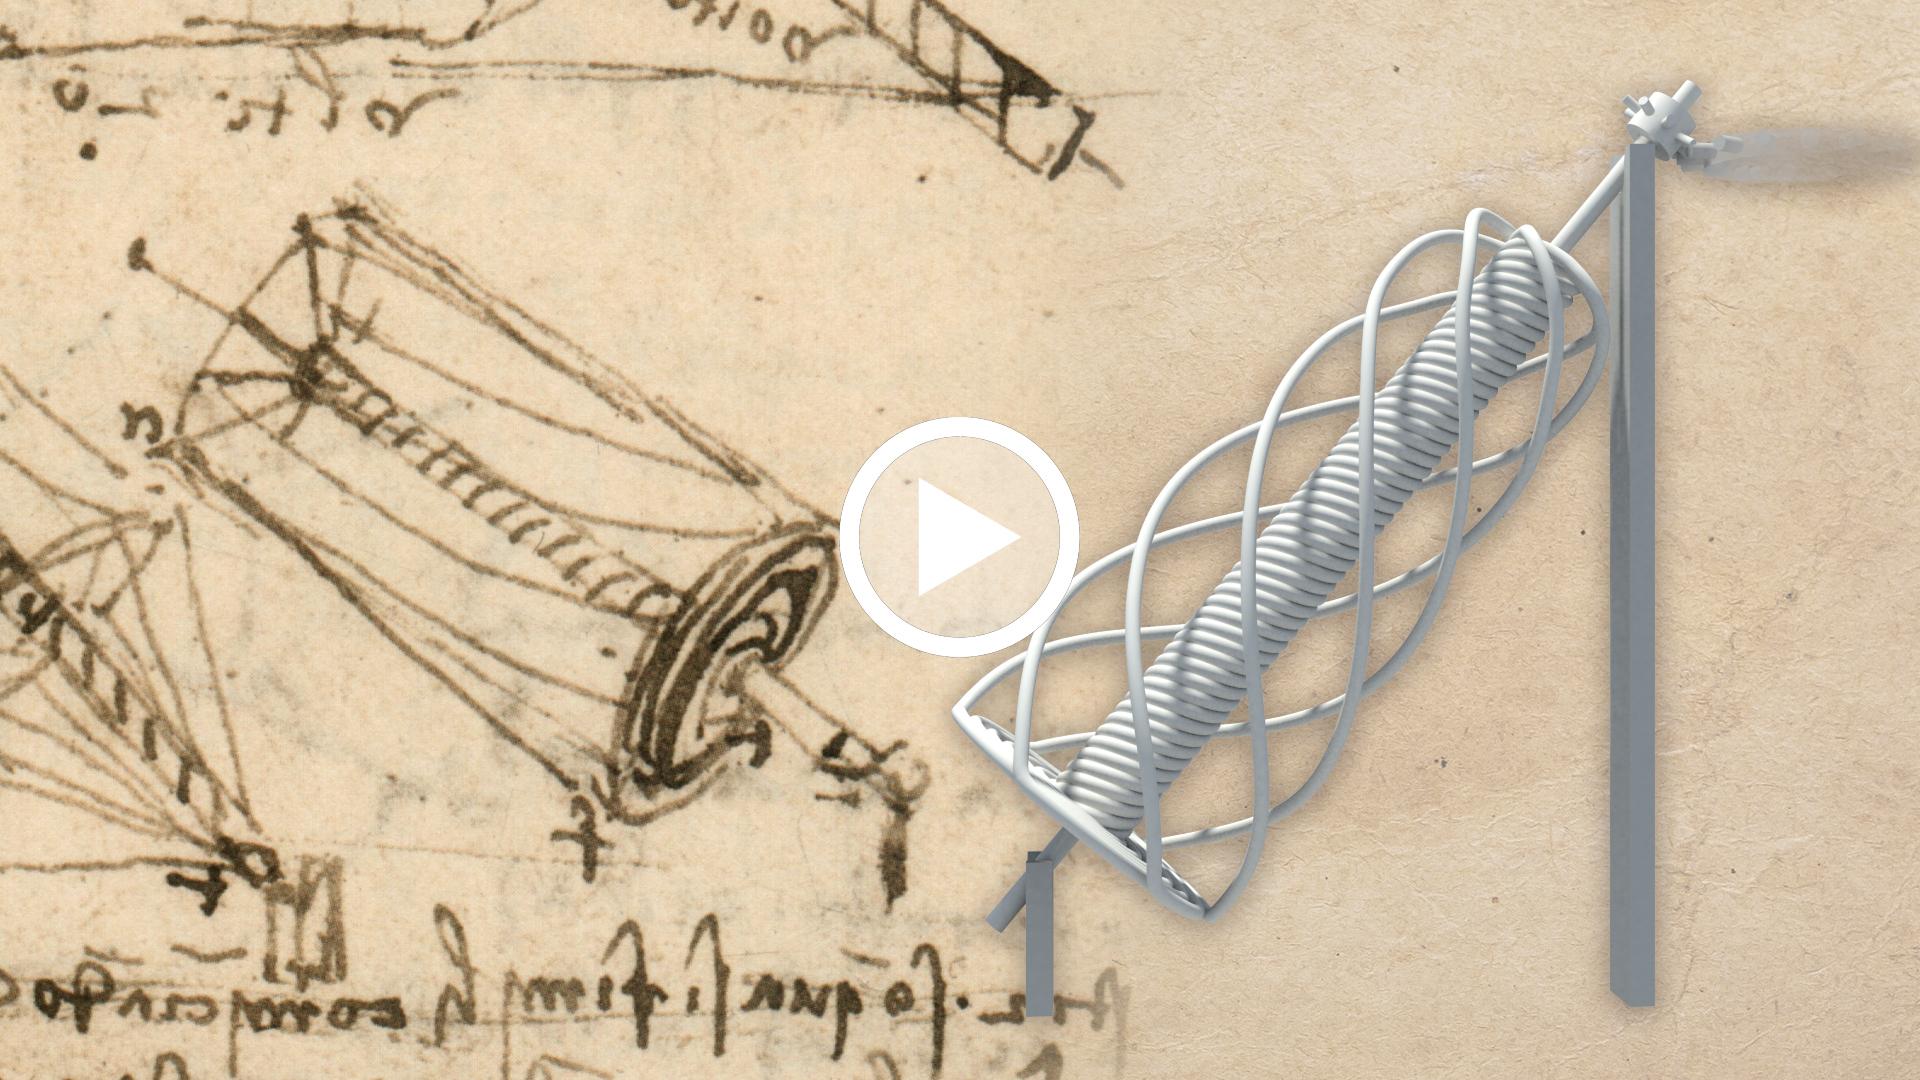 video Leonardo da Vinci, Studies of perpetual engines based on the Archimedean screw, For I 54v